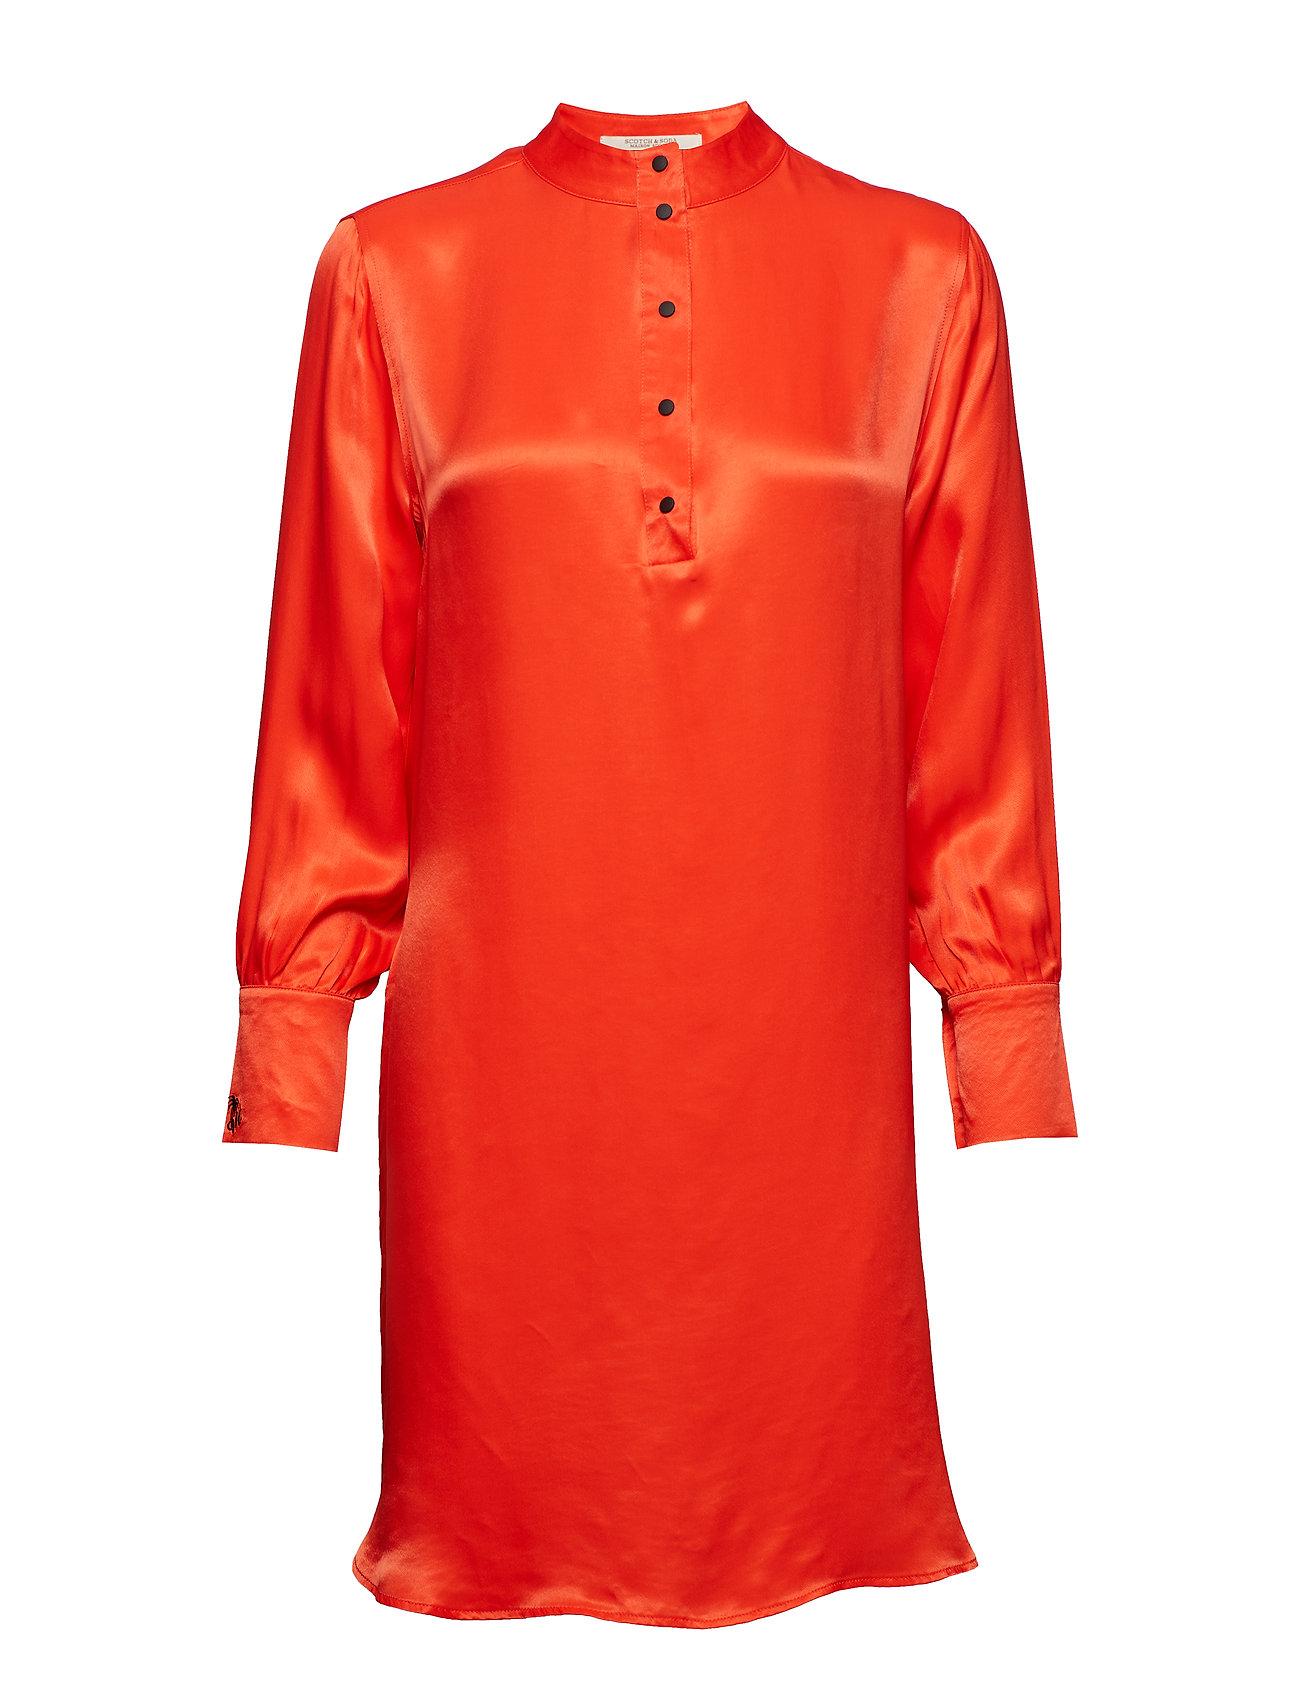 SCOTCH & SODA Shirt Dress In Viscose Quality